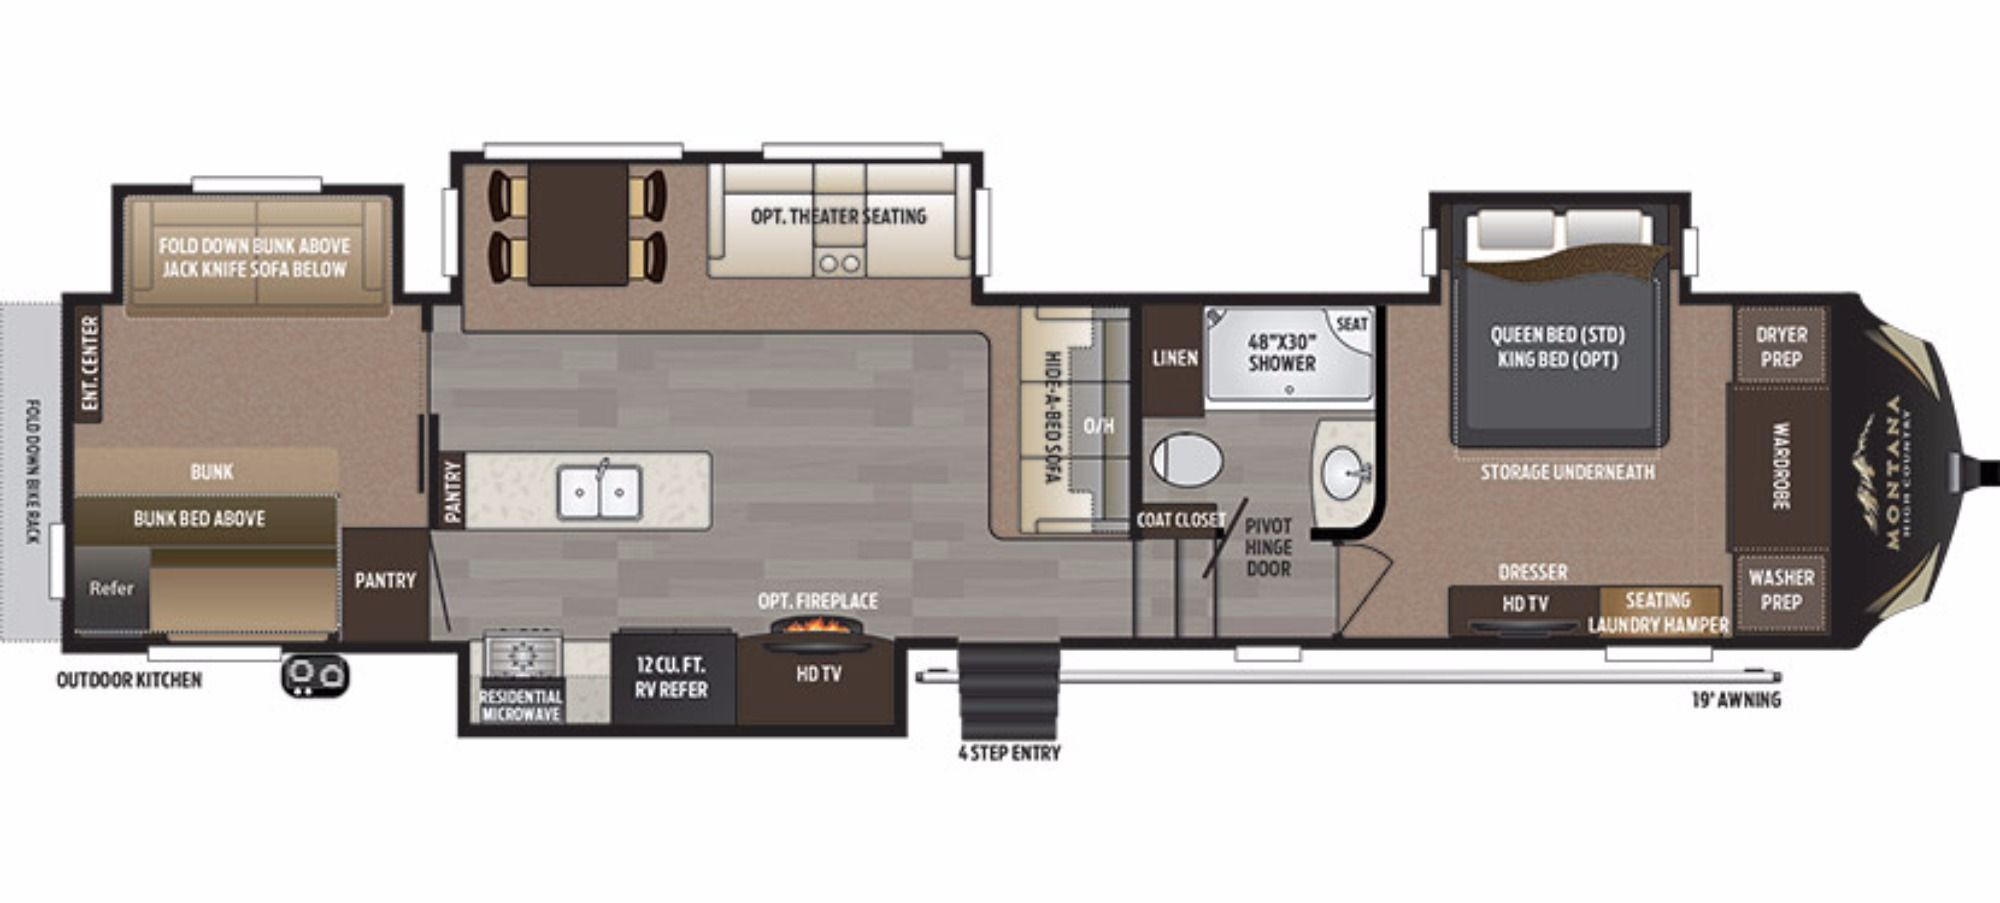 2017 KEYSTONE MONTANA HIGH COUNTRY 340BH Rv floor plans